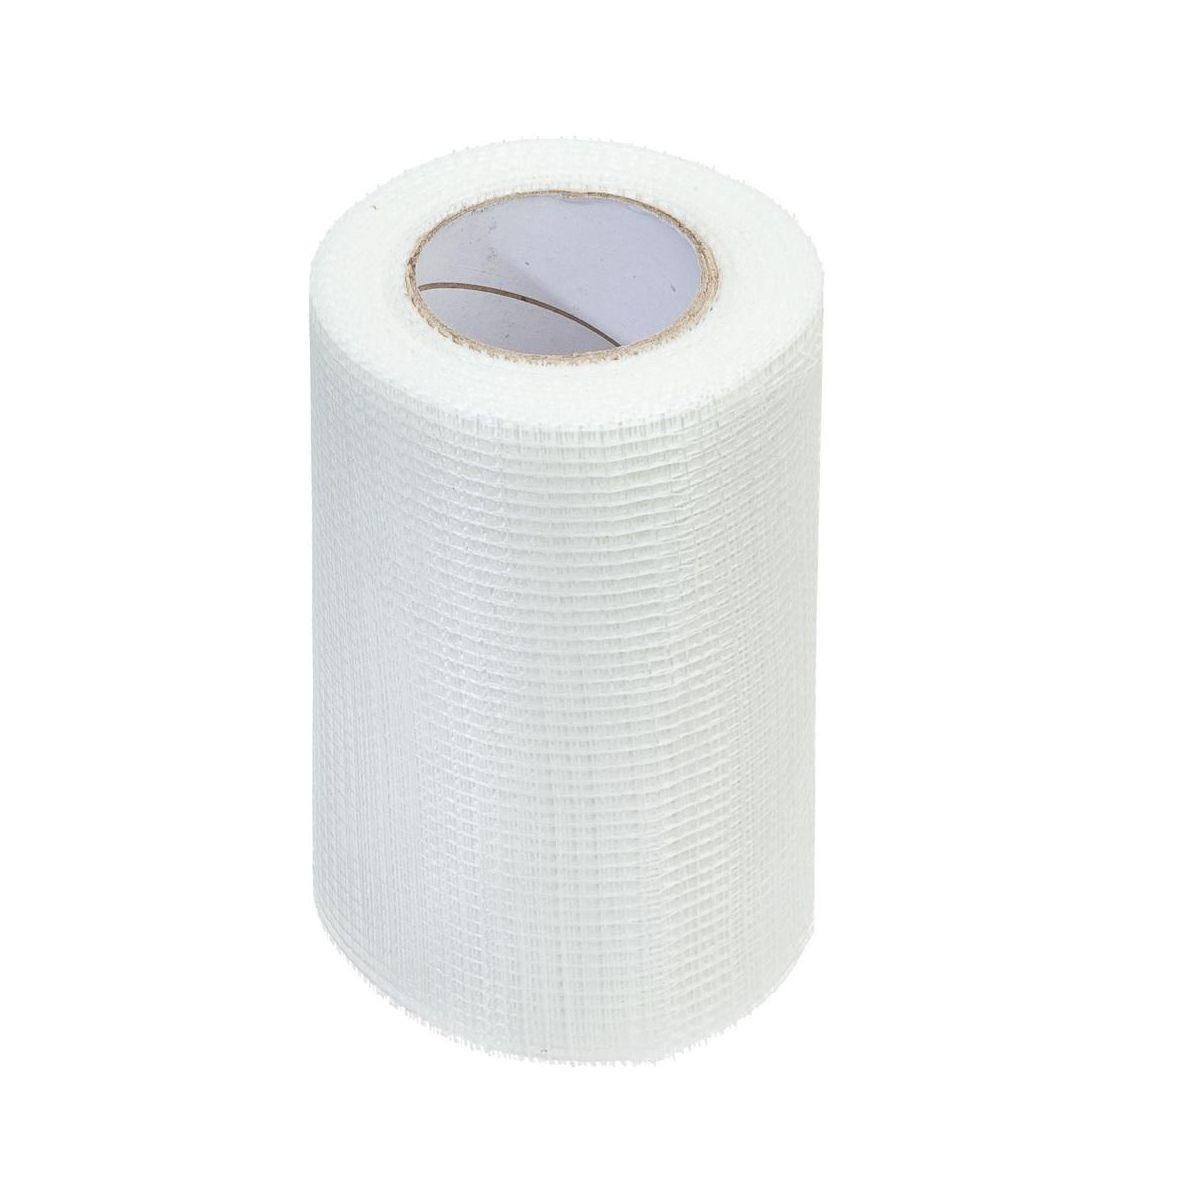 rednet rep gewebeband aus glasfasergewebe f r gipskarton kiosk rednet. Black Bedroom Furniture Sets. Home Design Ideas